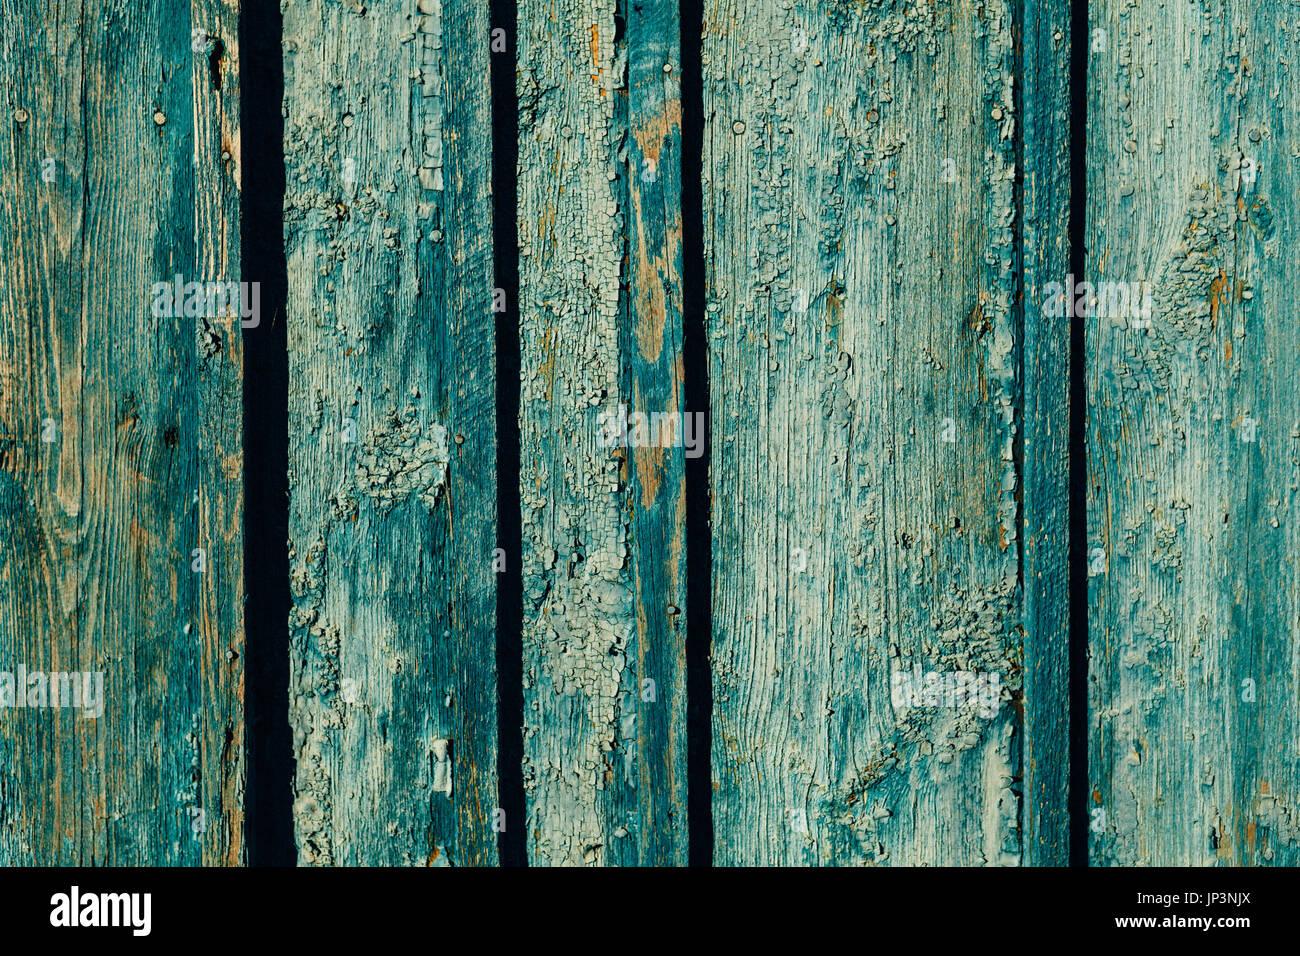 Gray Panels Stockfotos & Gray Panels Bilder - Seite 3 - Alamy